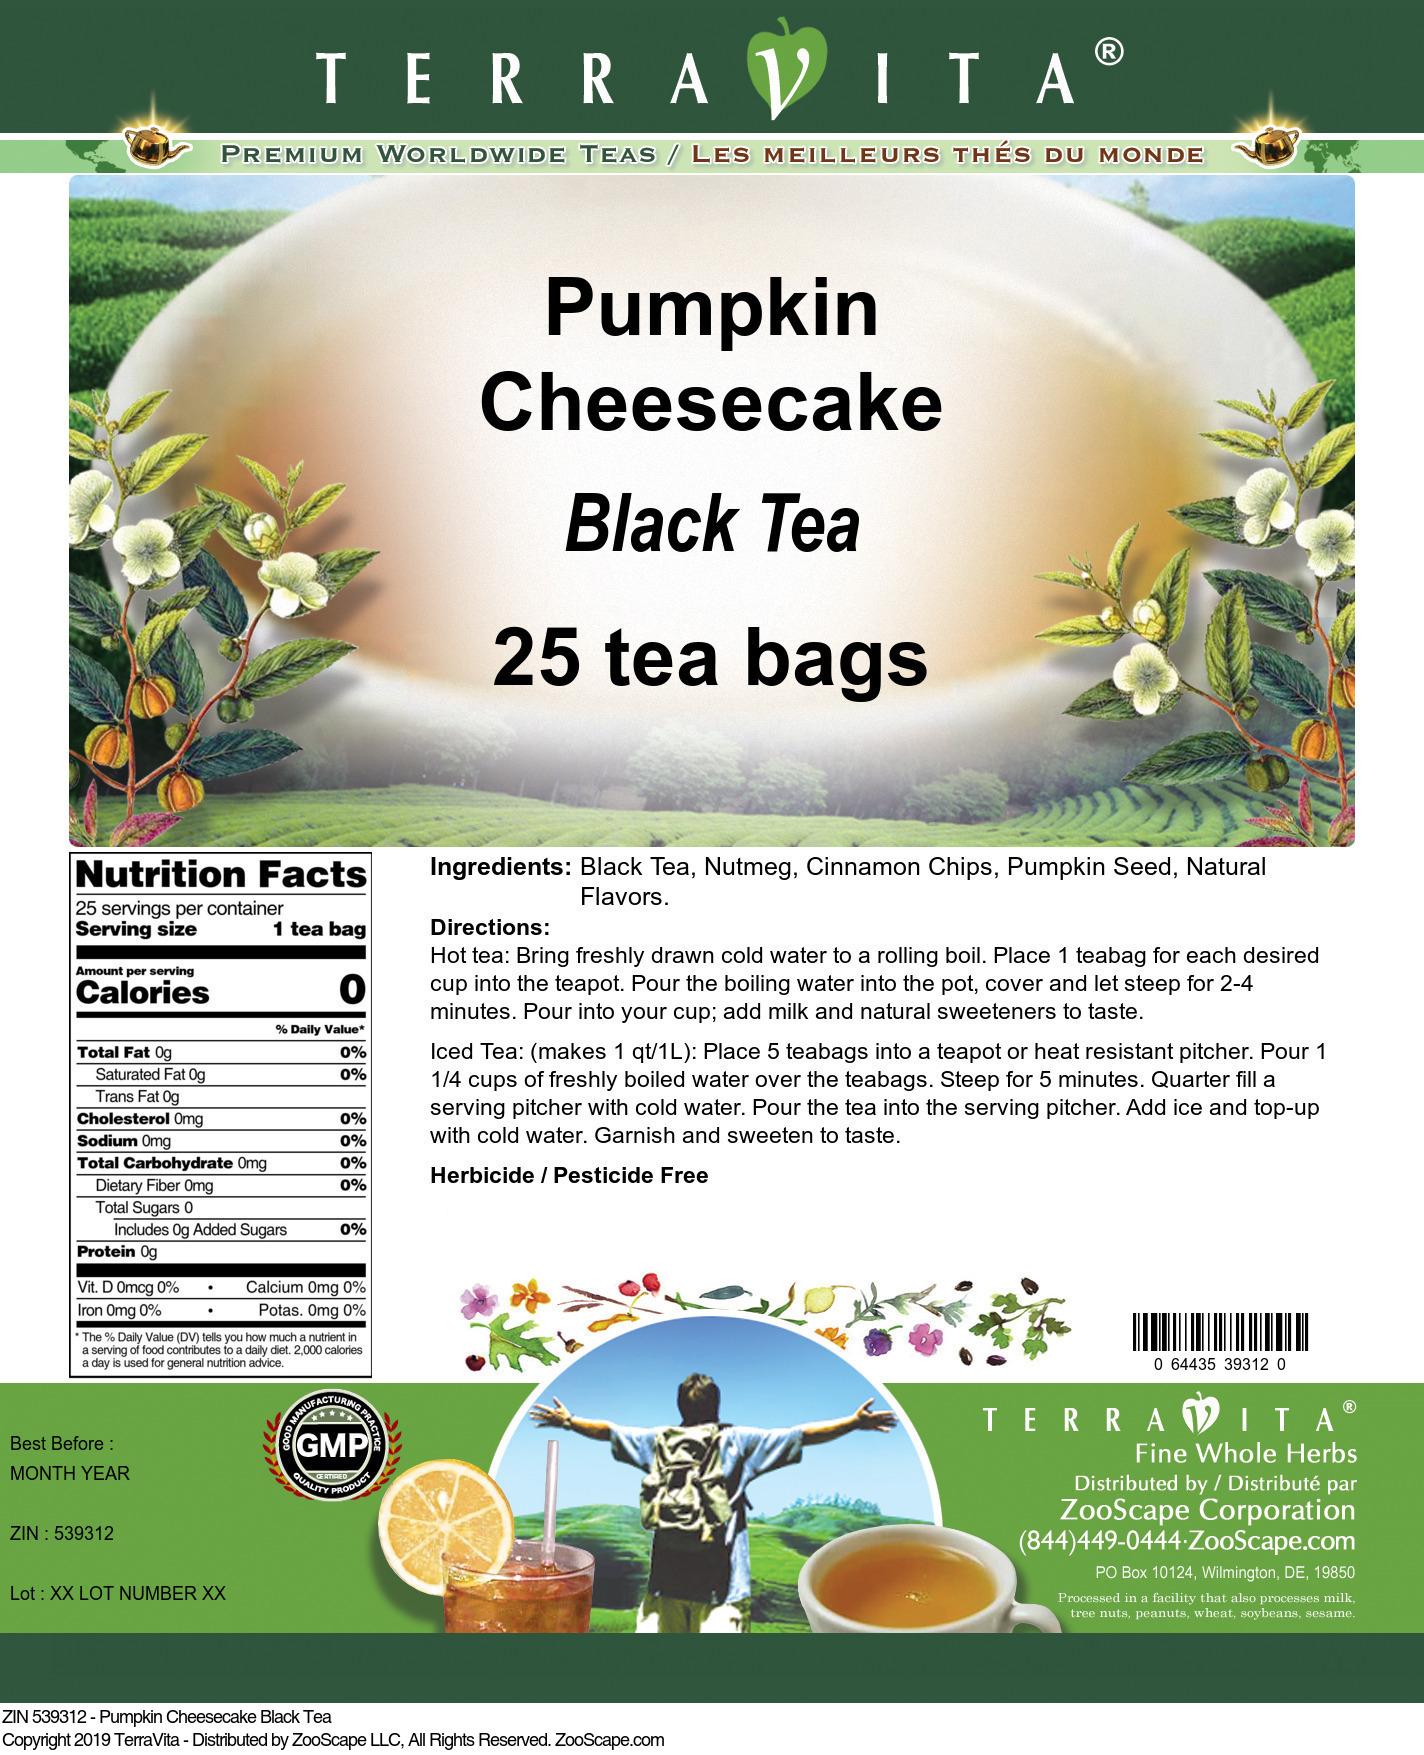 Pumpkin Cheesecake Black Tea